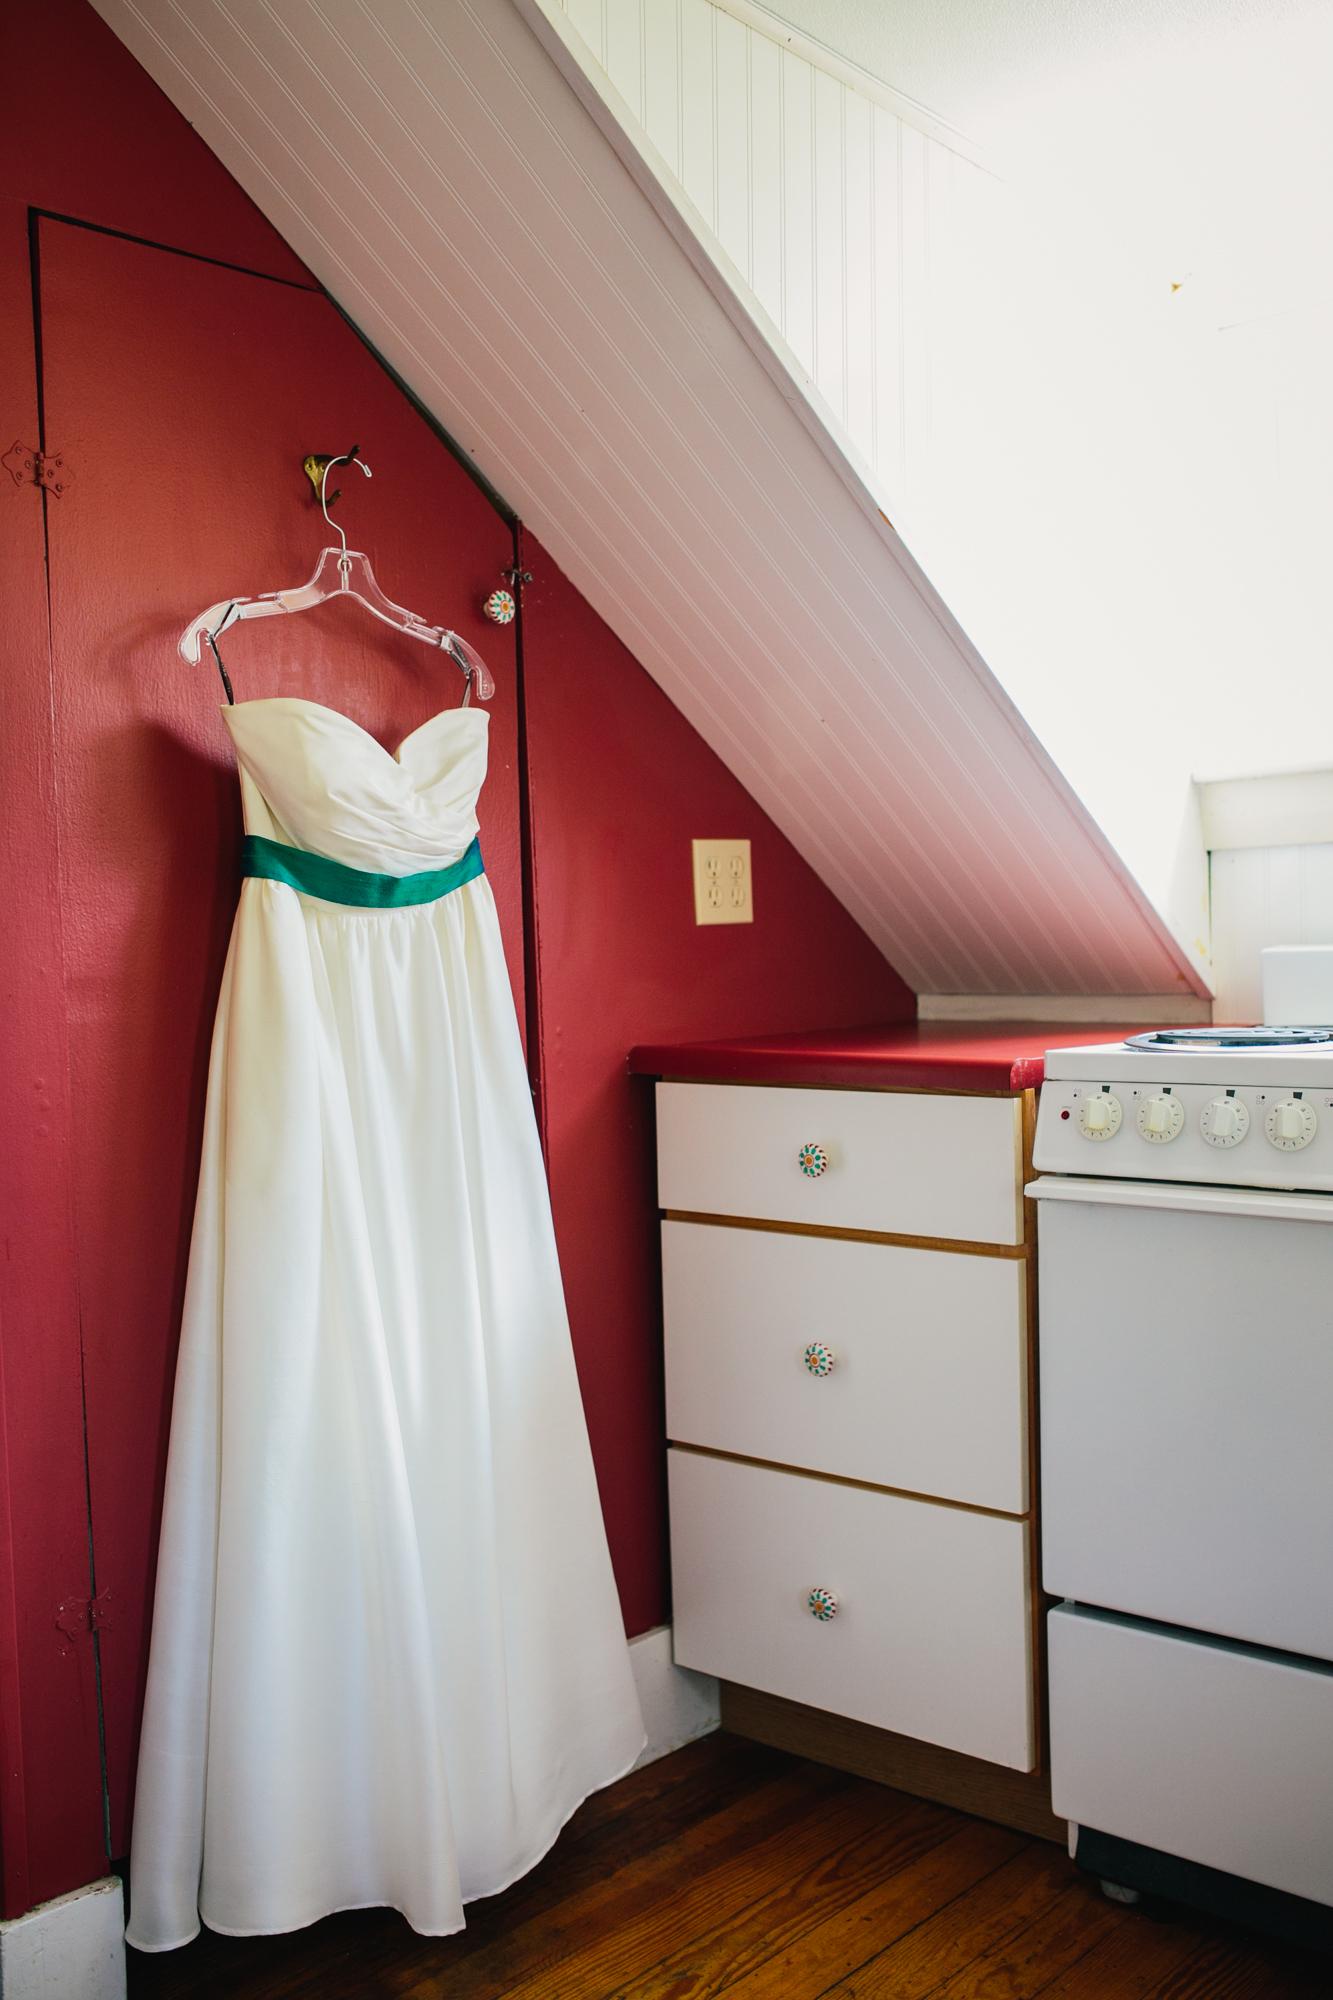 The-Shovel-Handle-Inn-Barn-Wedding-New-Hampshire-New-England-Wedding-Photography-6.jpg